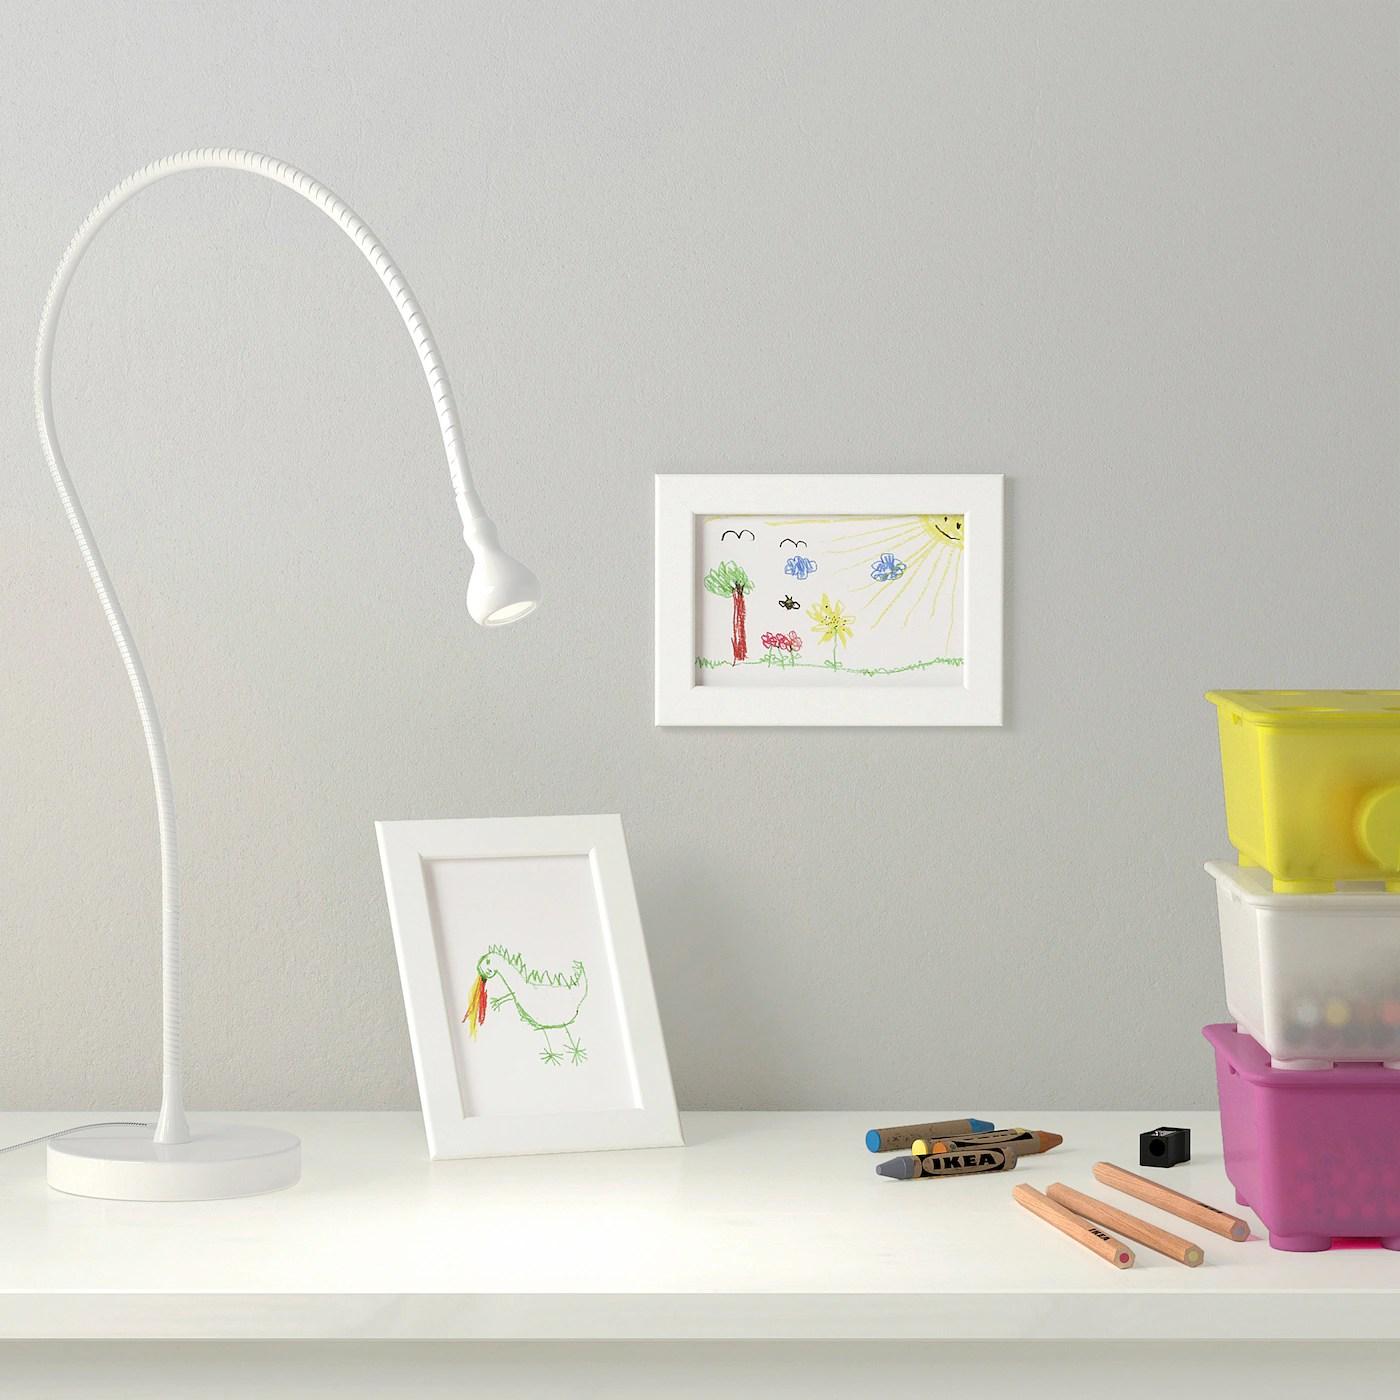 fiskbo cadre blanc 10x15 cm